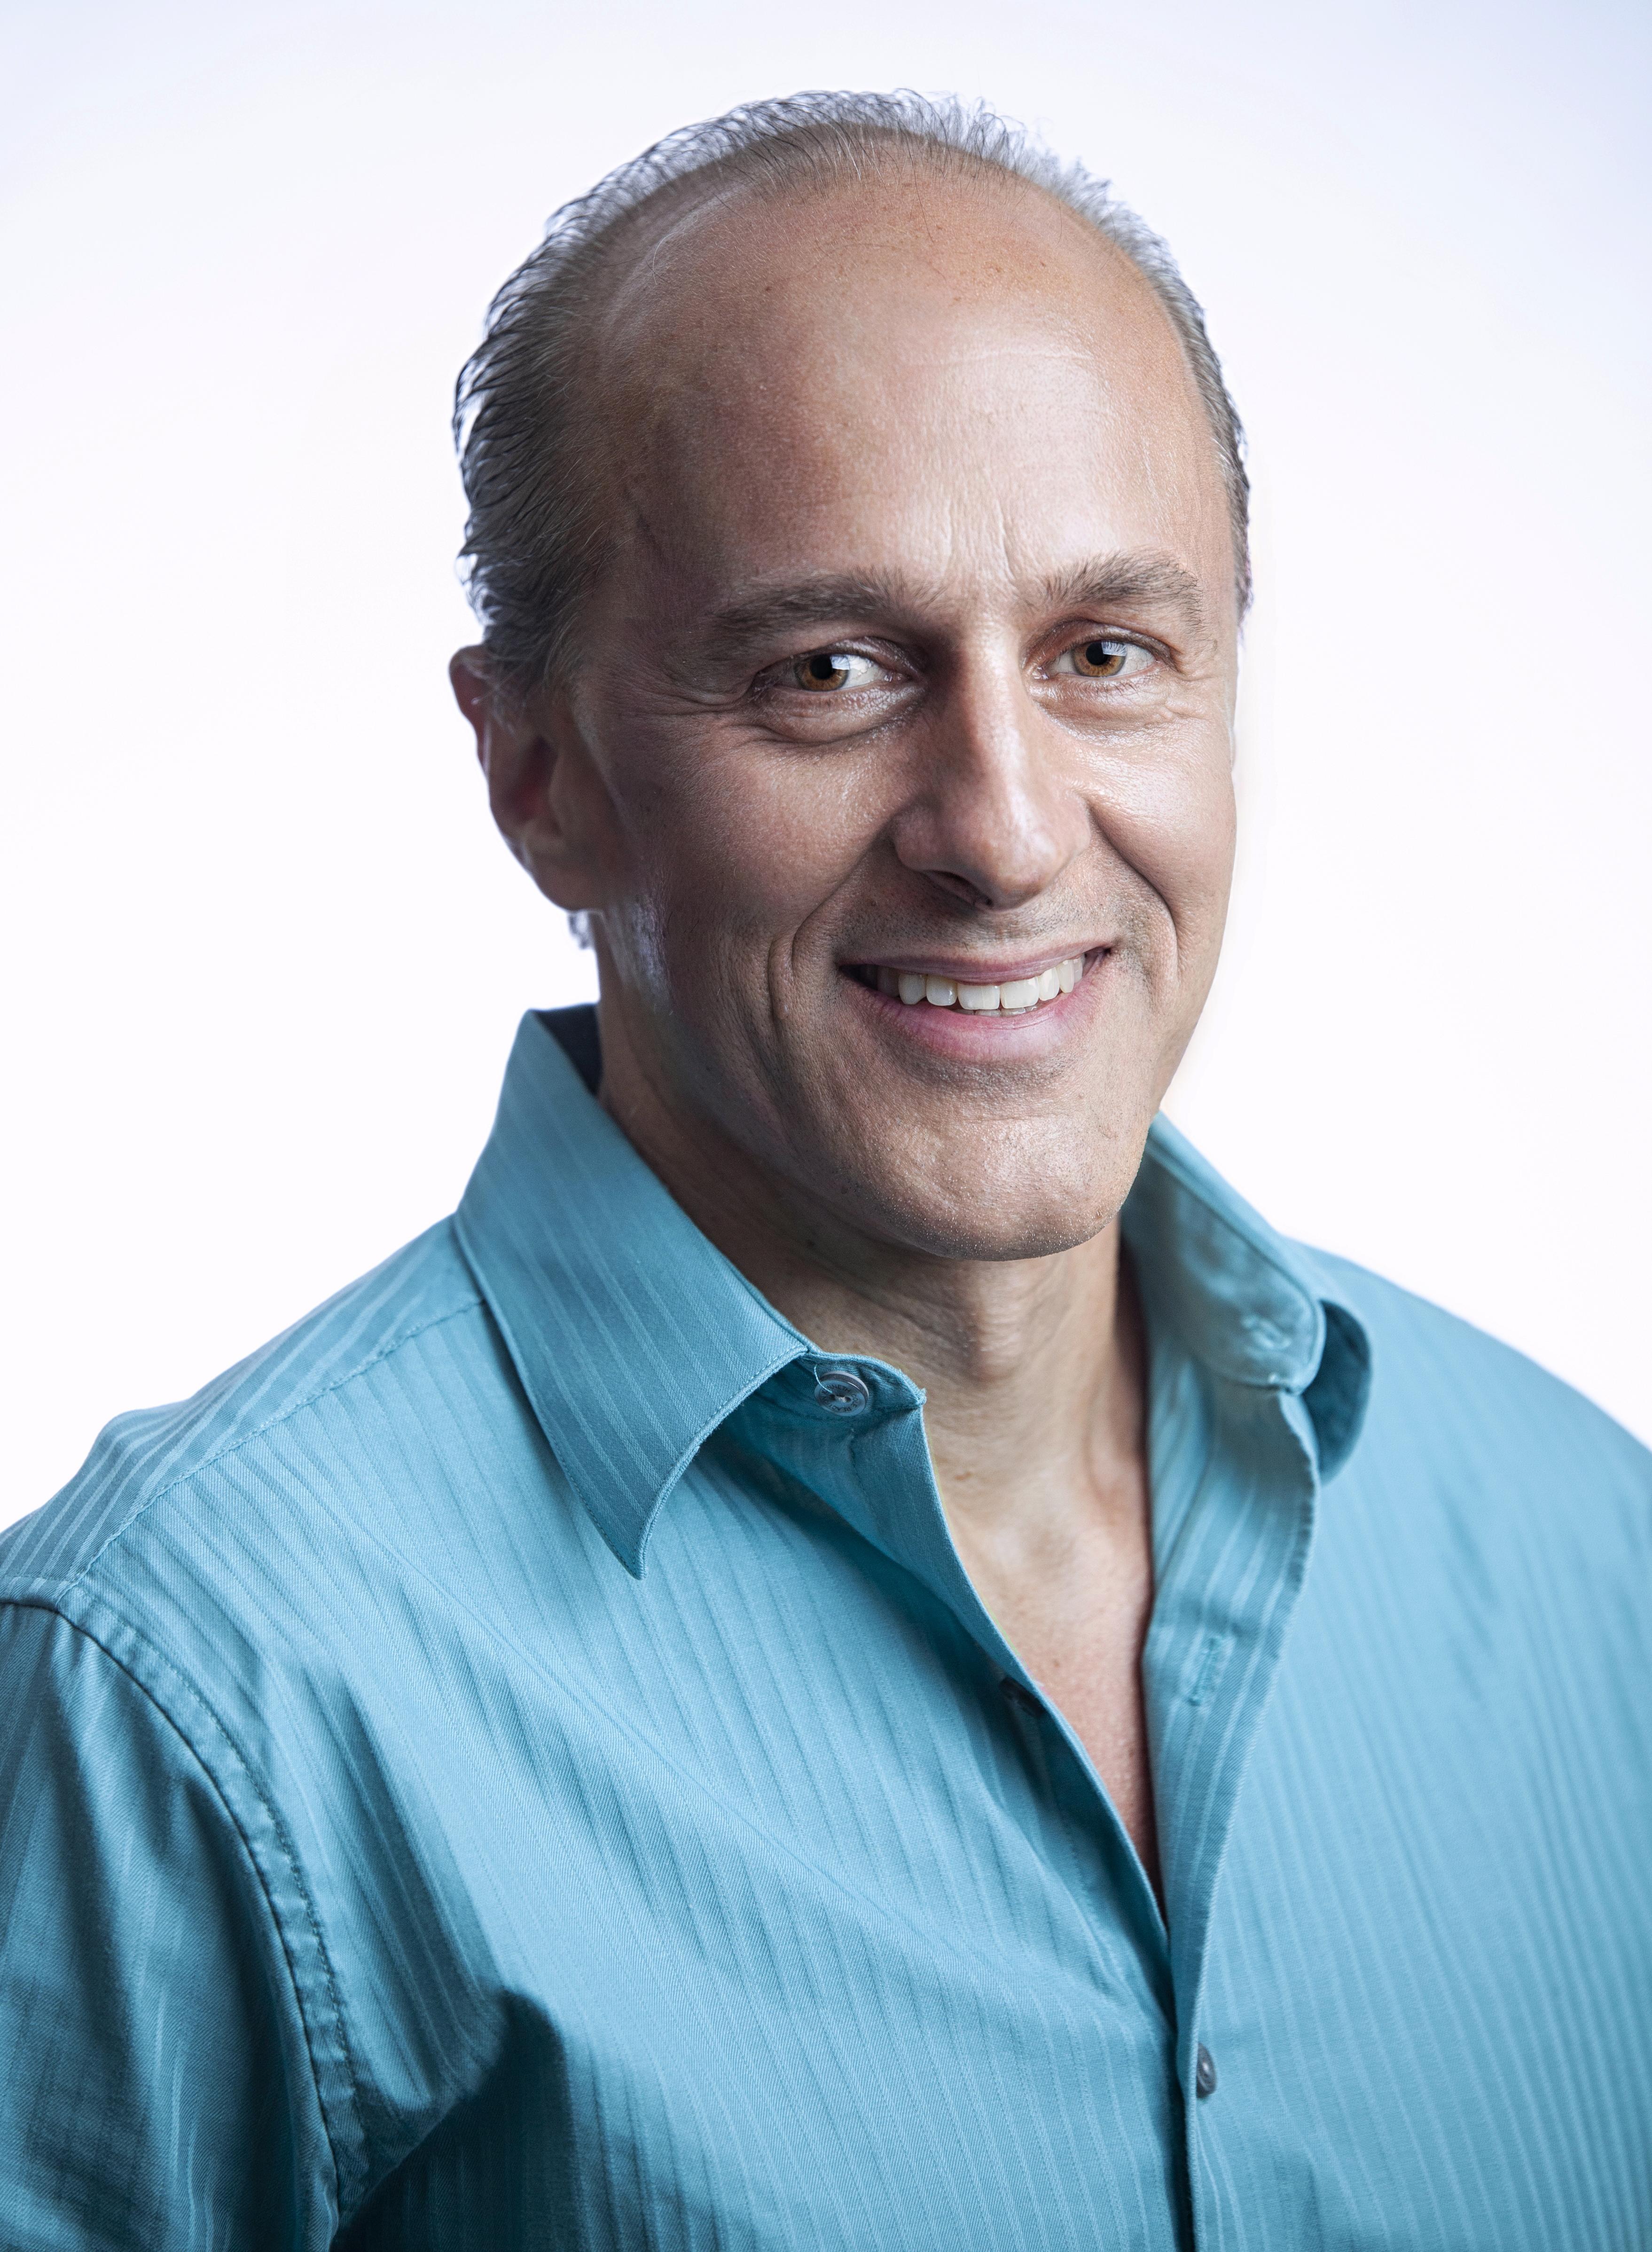 Dr. Michael Christopher